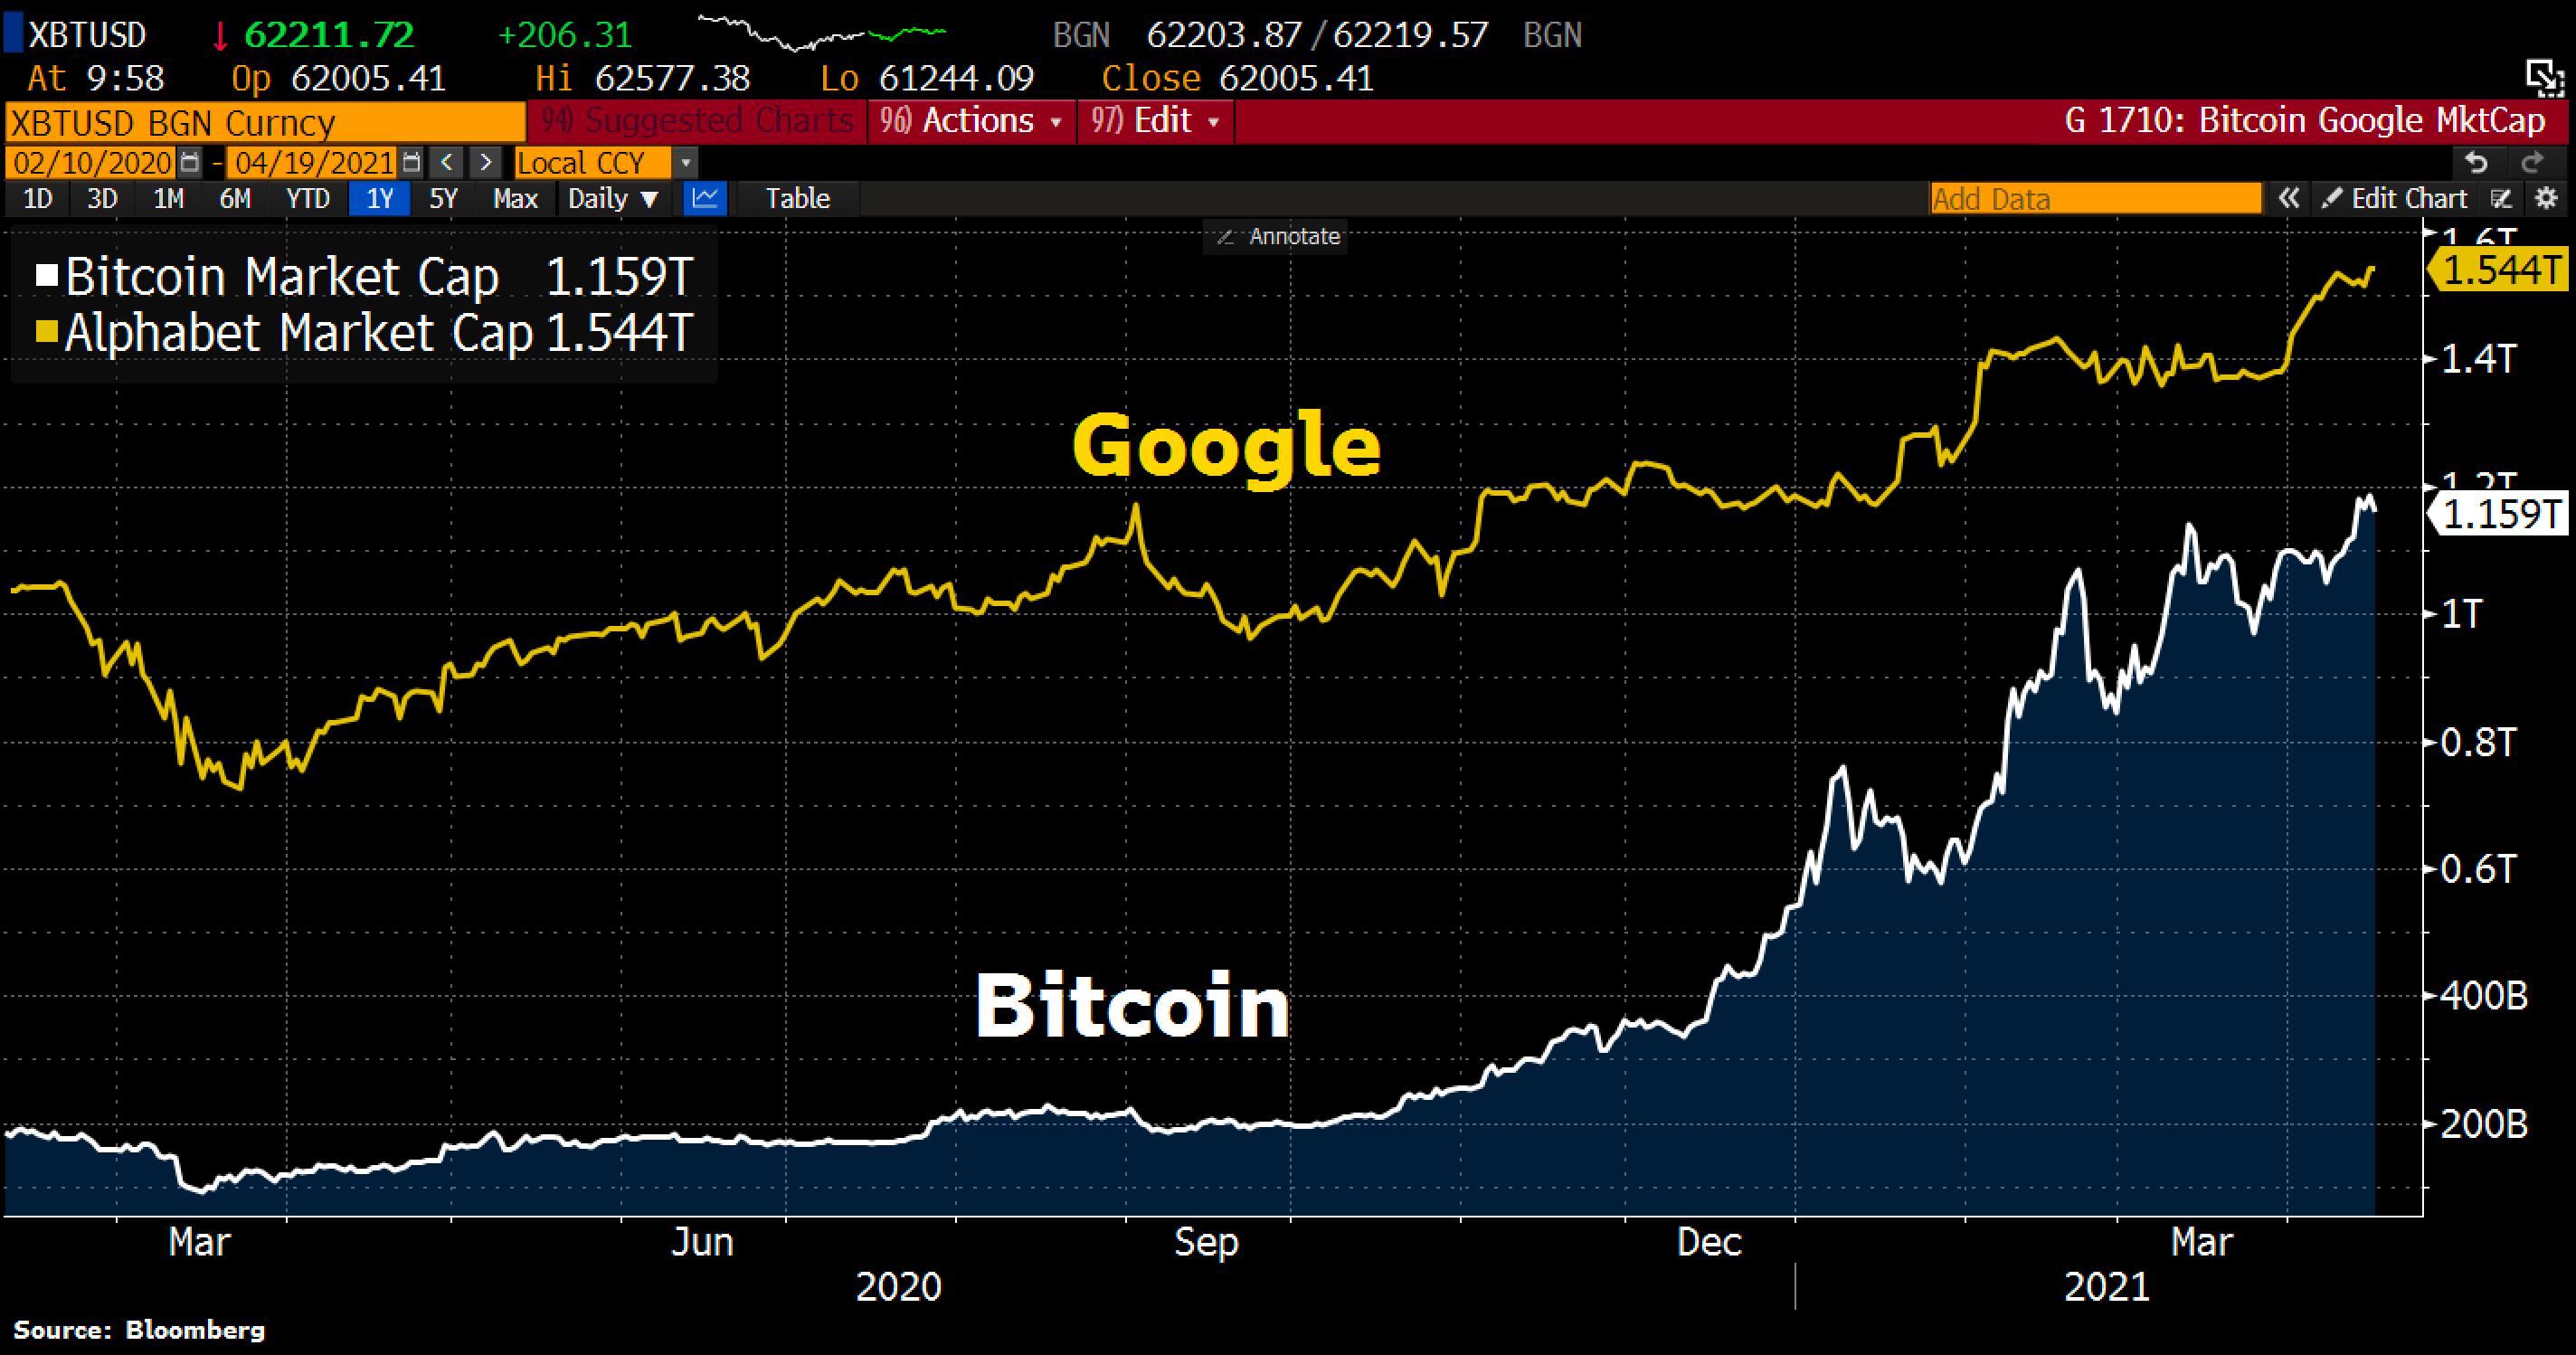 Is Bitcoin becoming the 'Google' of crypto as BTC market cap nears new milestone?